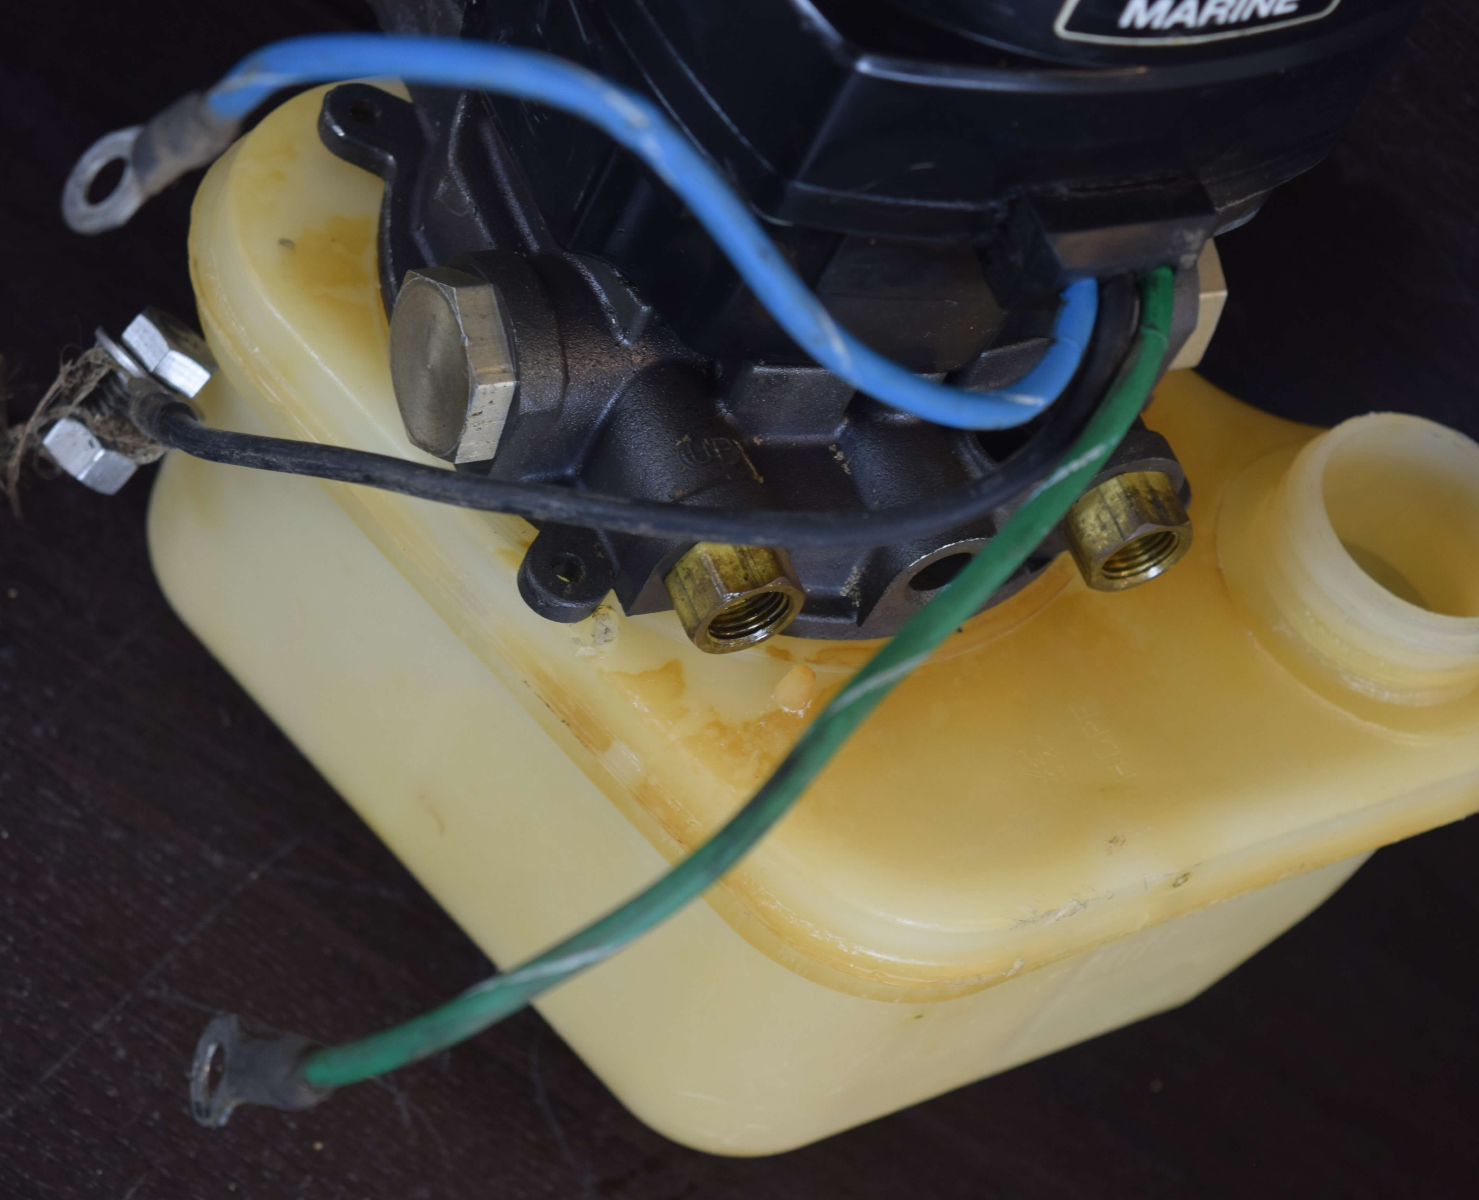 Mercury Mercruiser 2 Line Power Trim Pump & Motor TESTED!